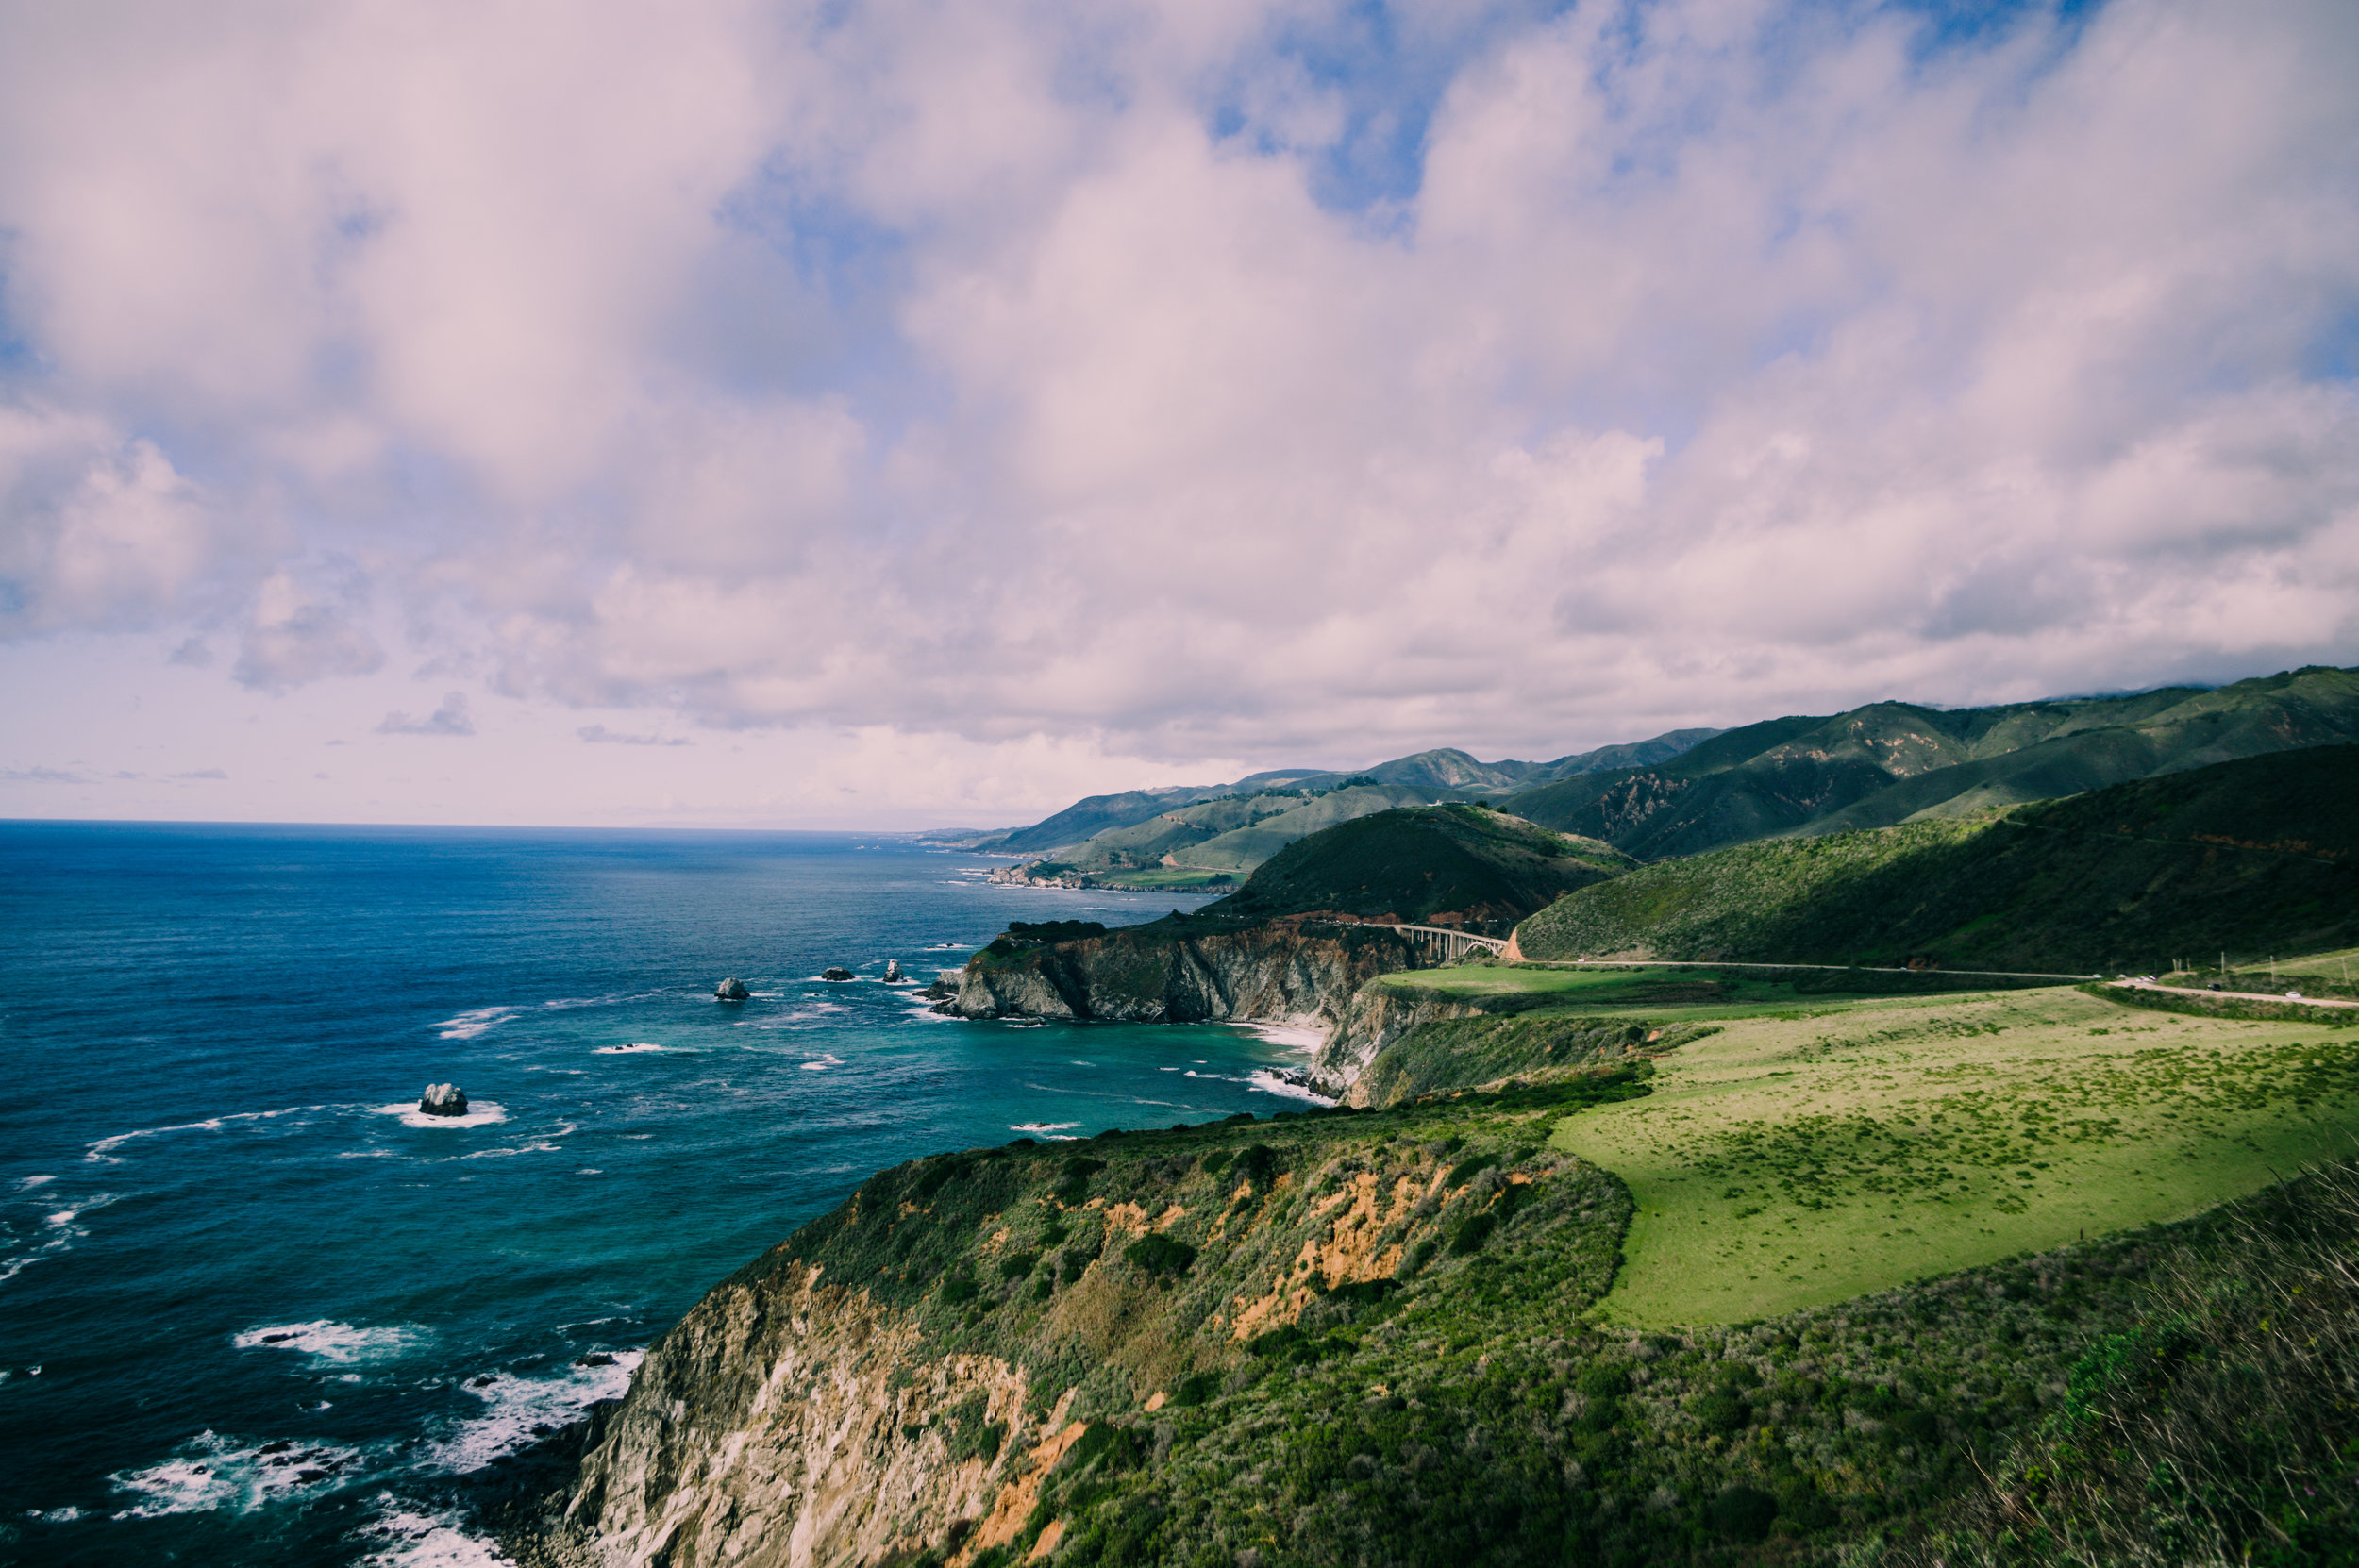 Pacific Coast Highway just north of Big Sur.